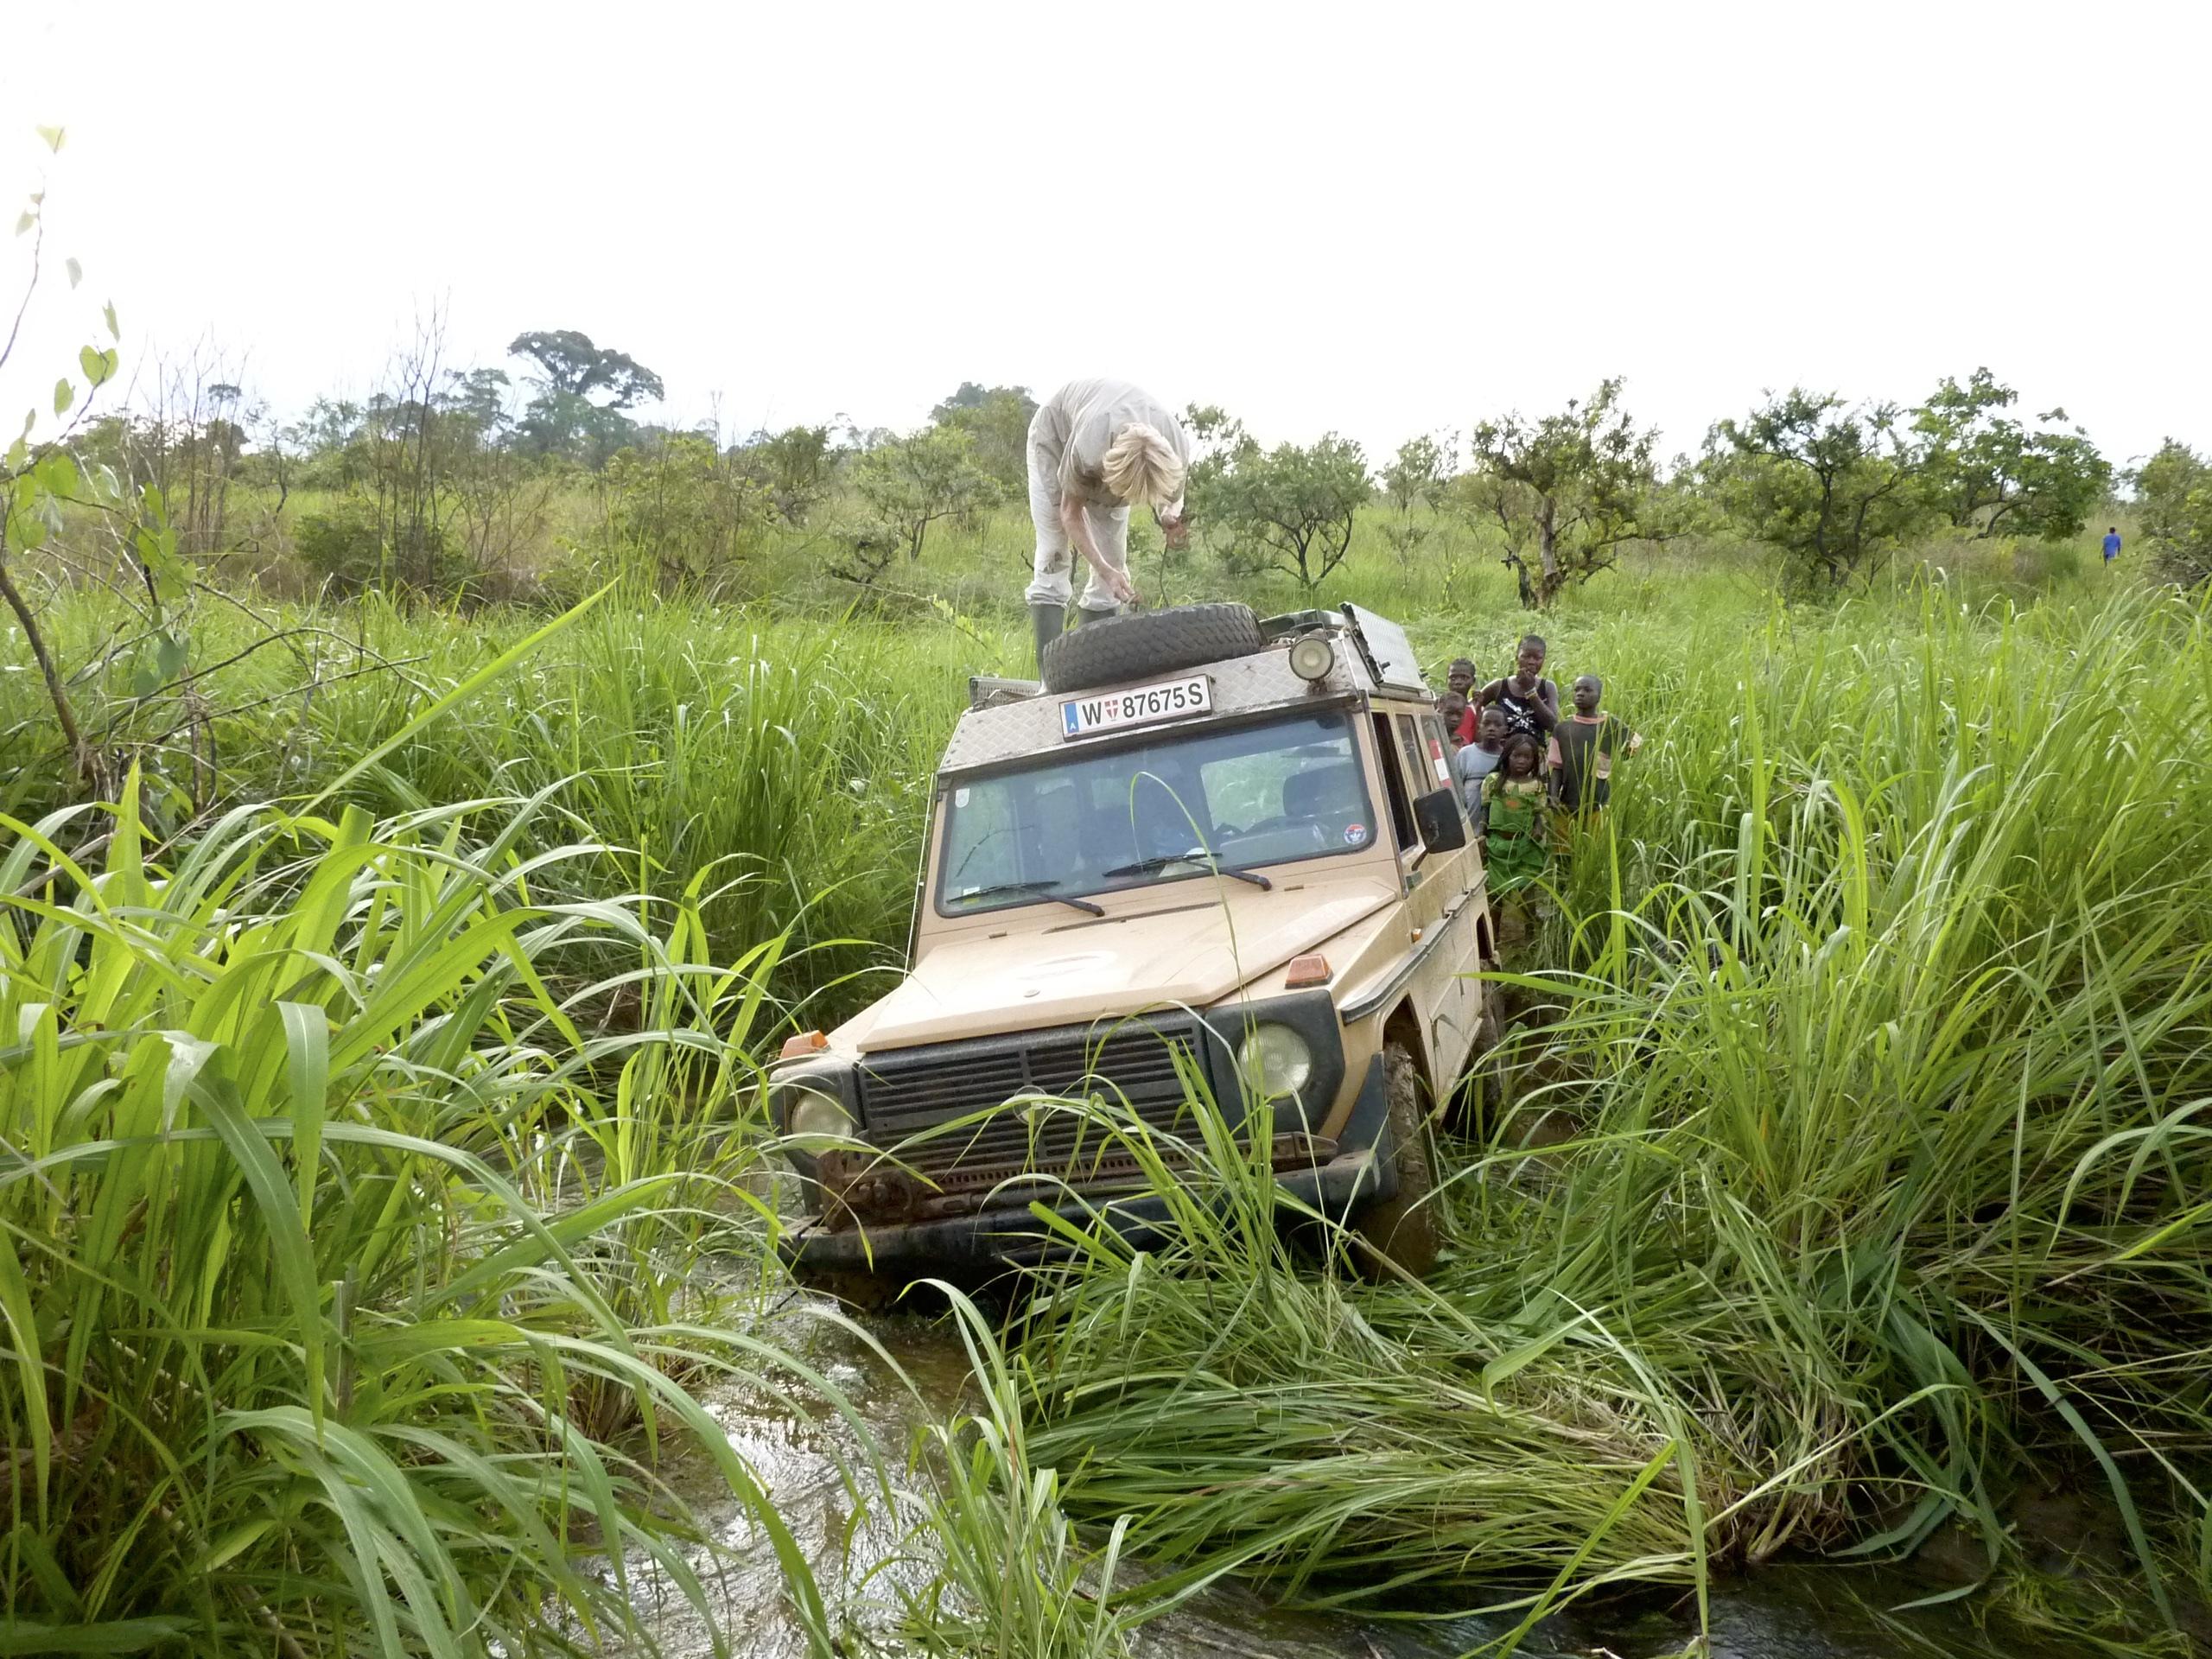 4x4 Abenteuerreise: Baden in Afrika 3